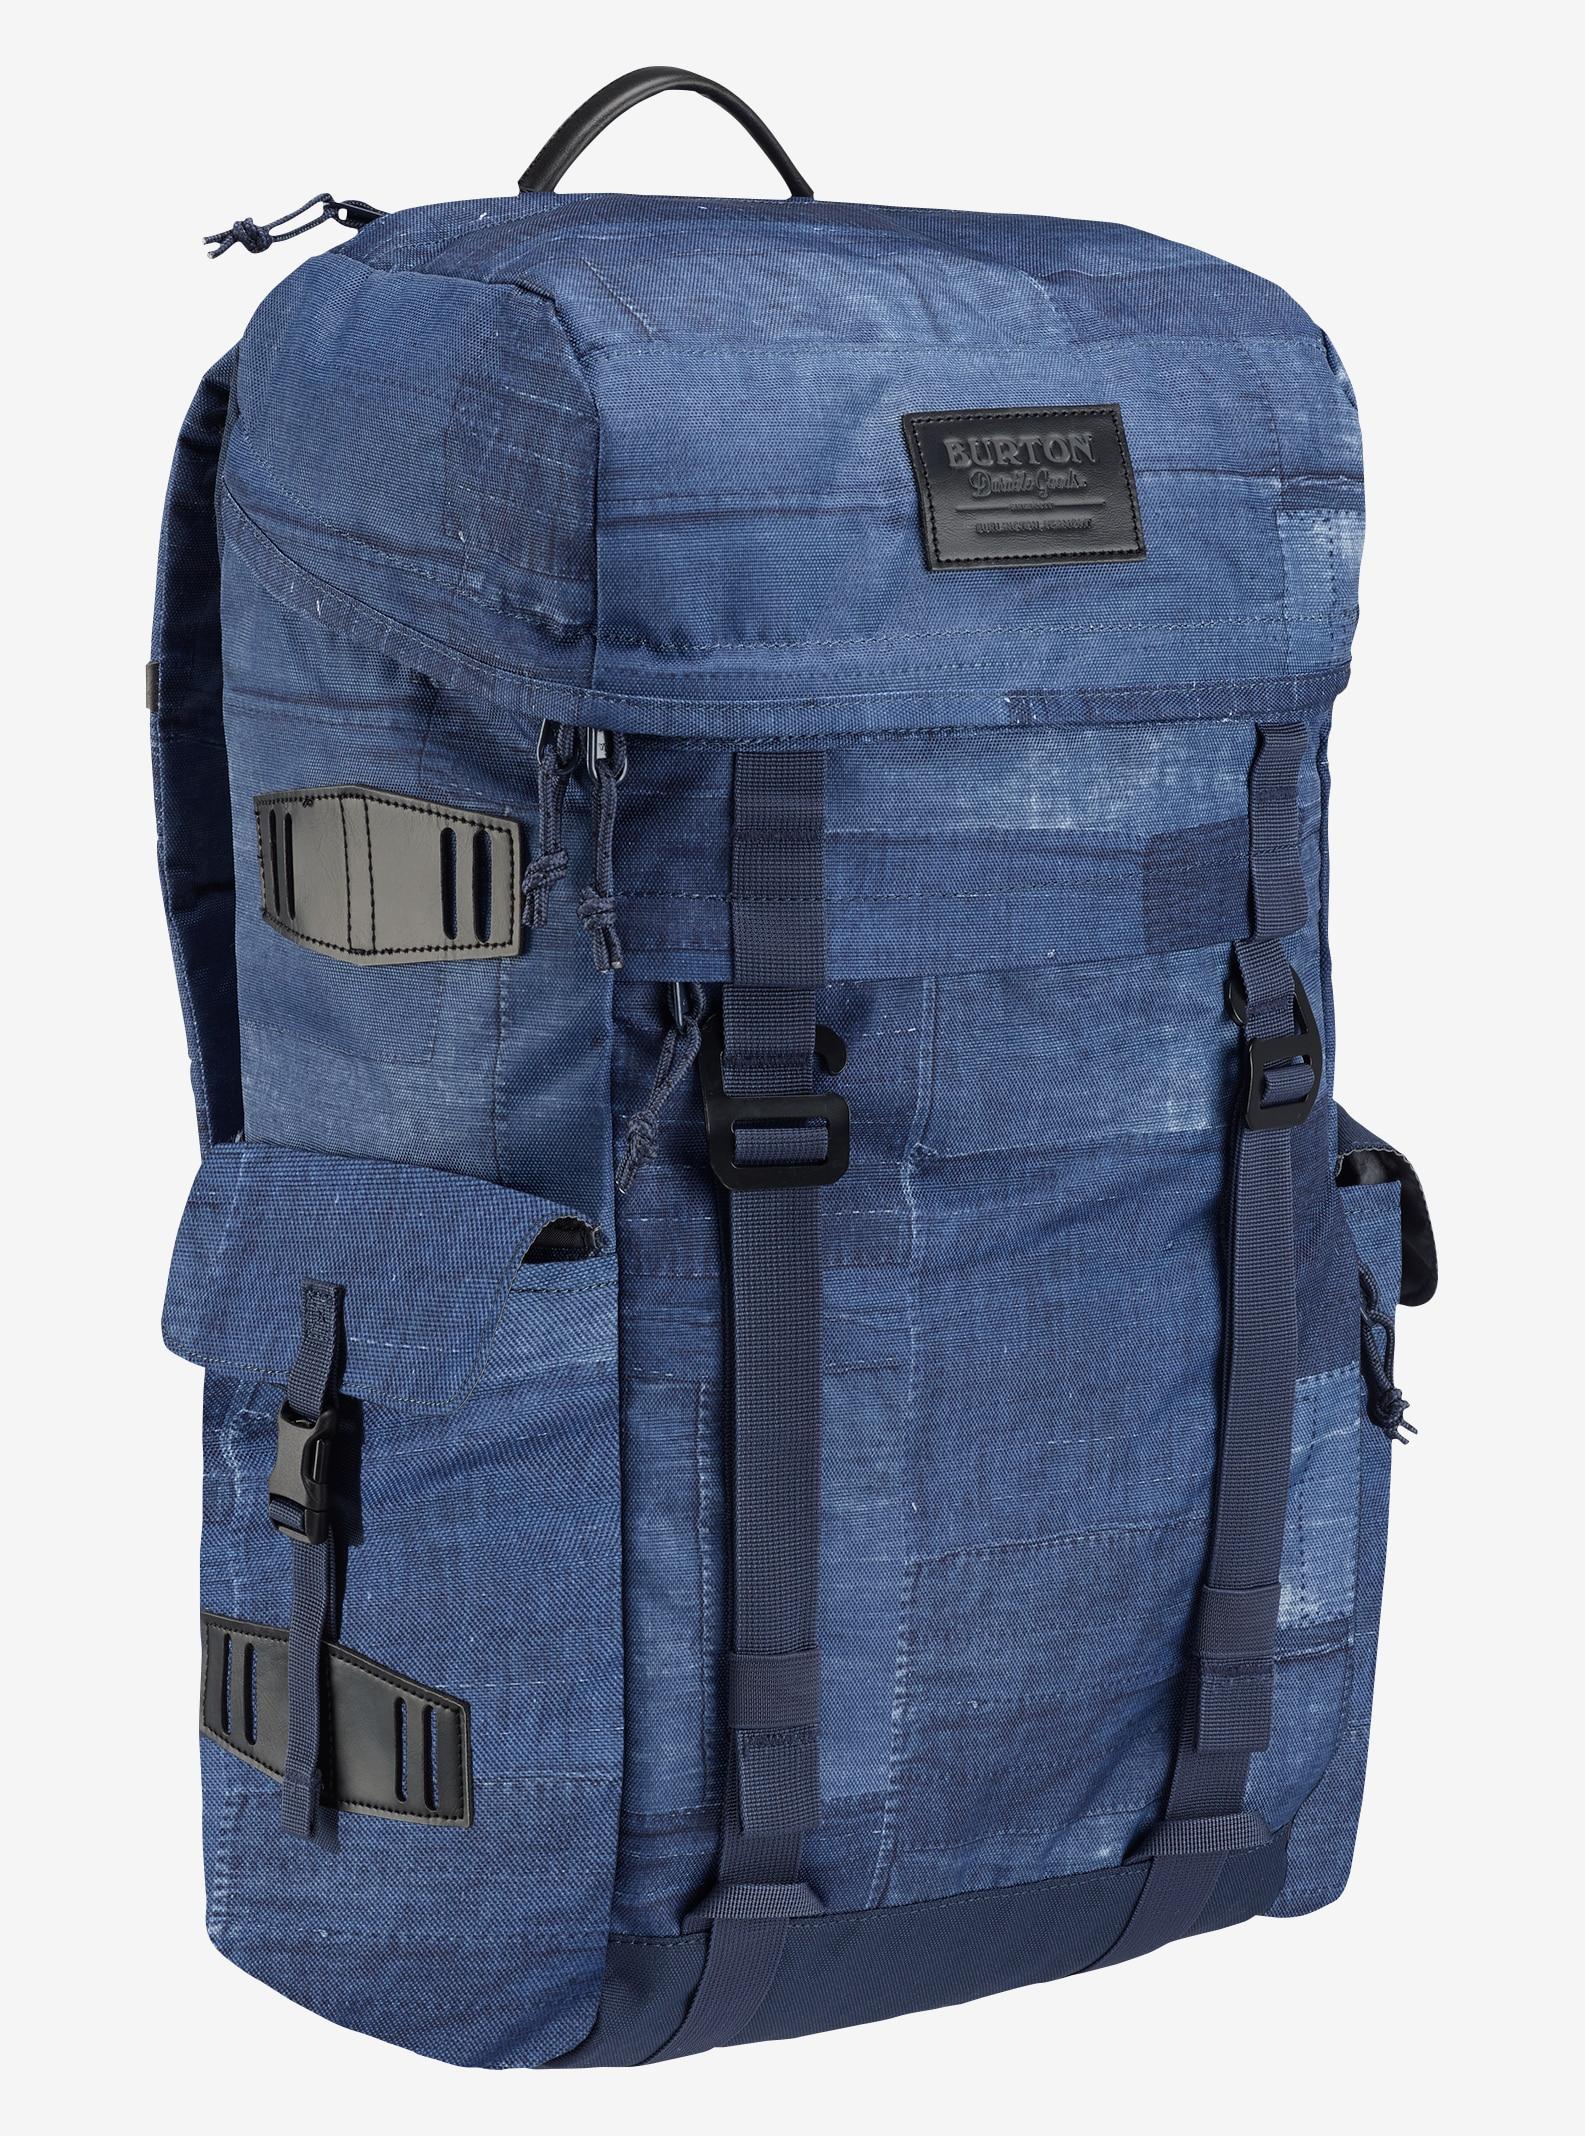 Burton Annex Backpack shown in Indiohobo Print